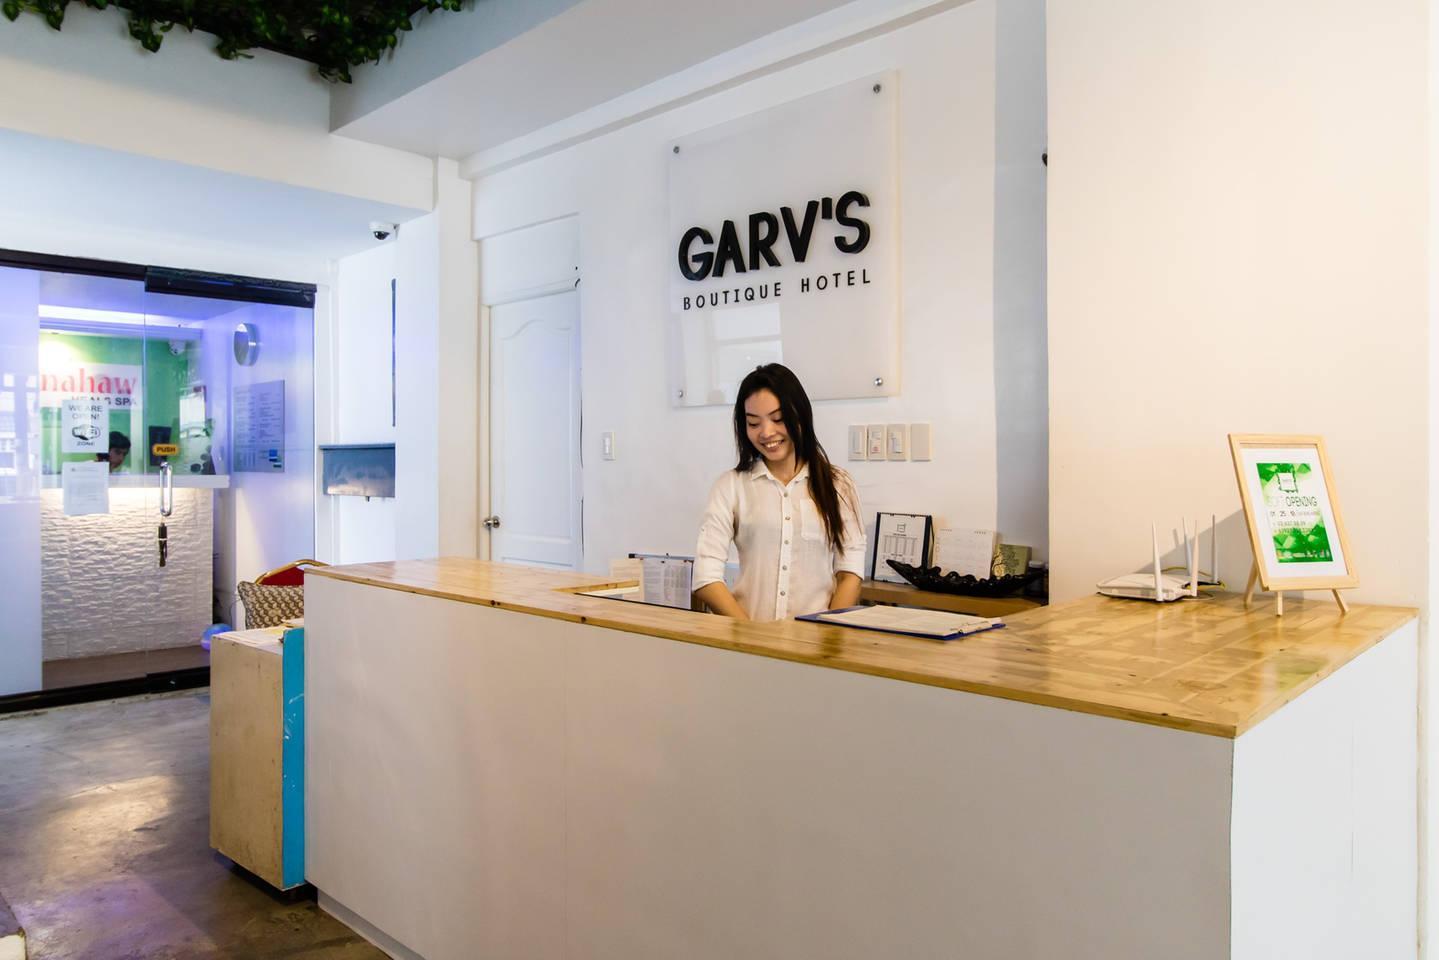 Garv's Boutique Hotel, Mandaluyong